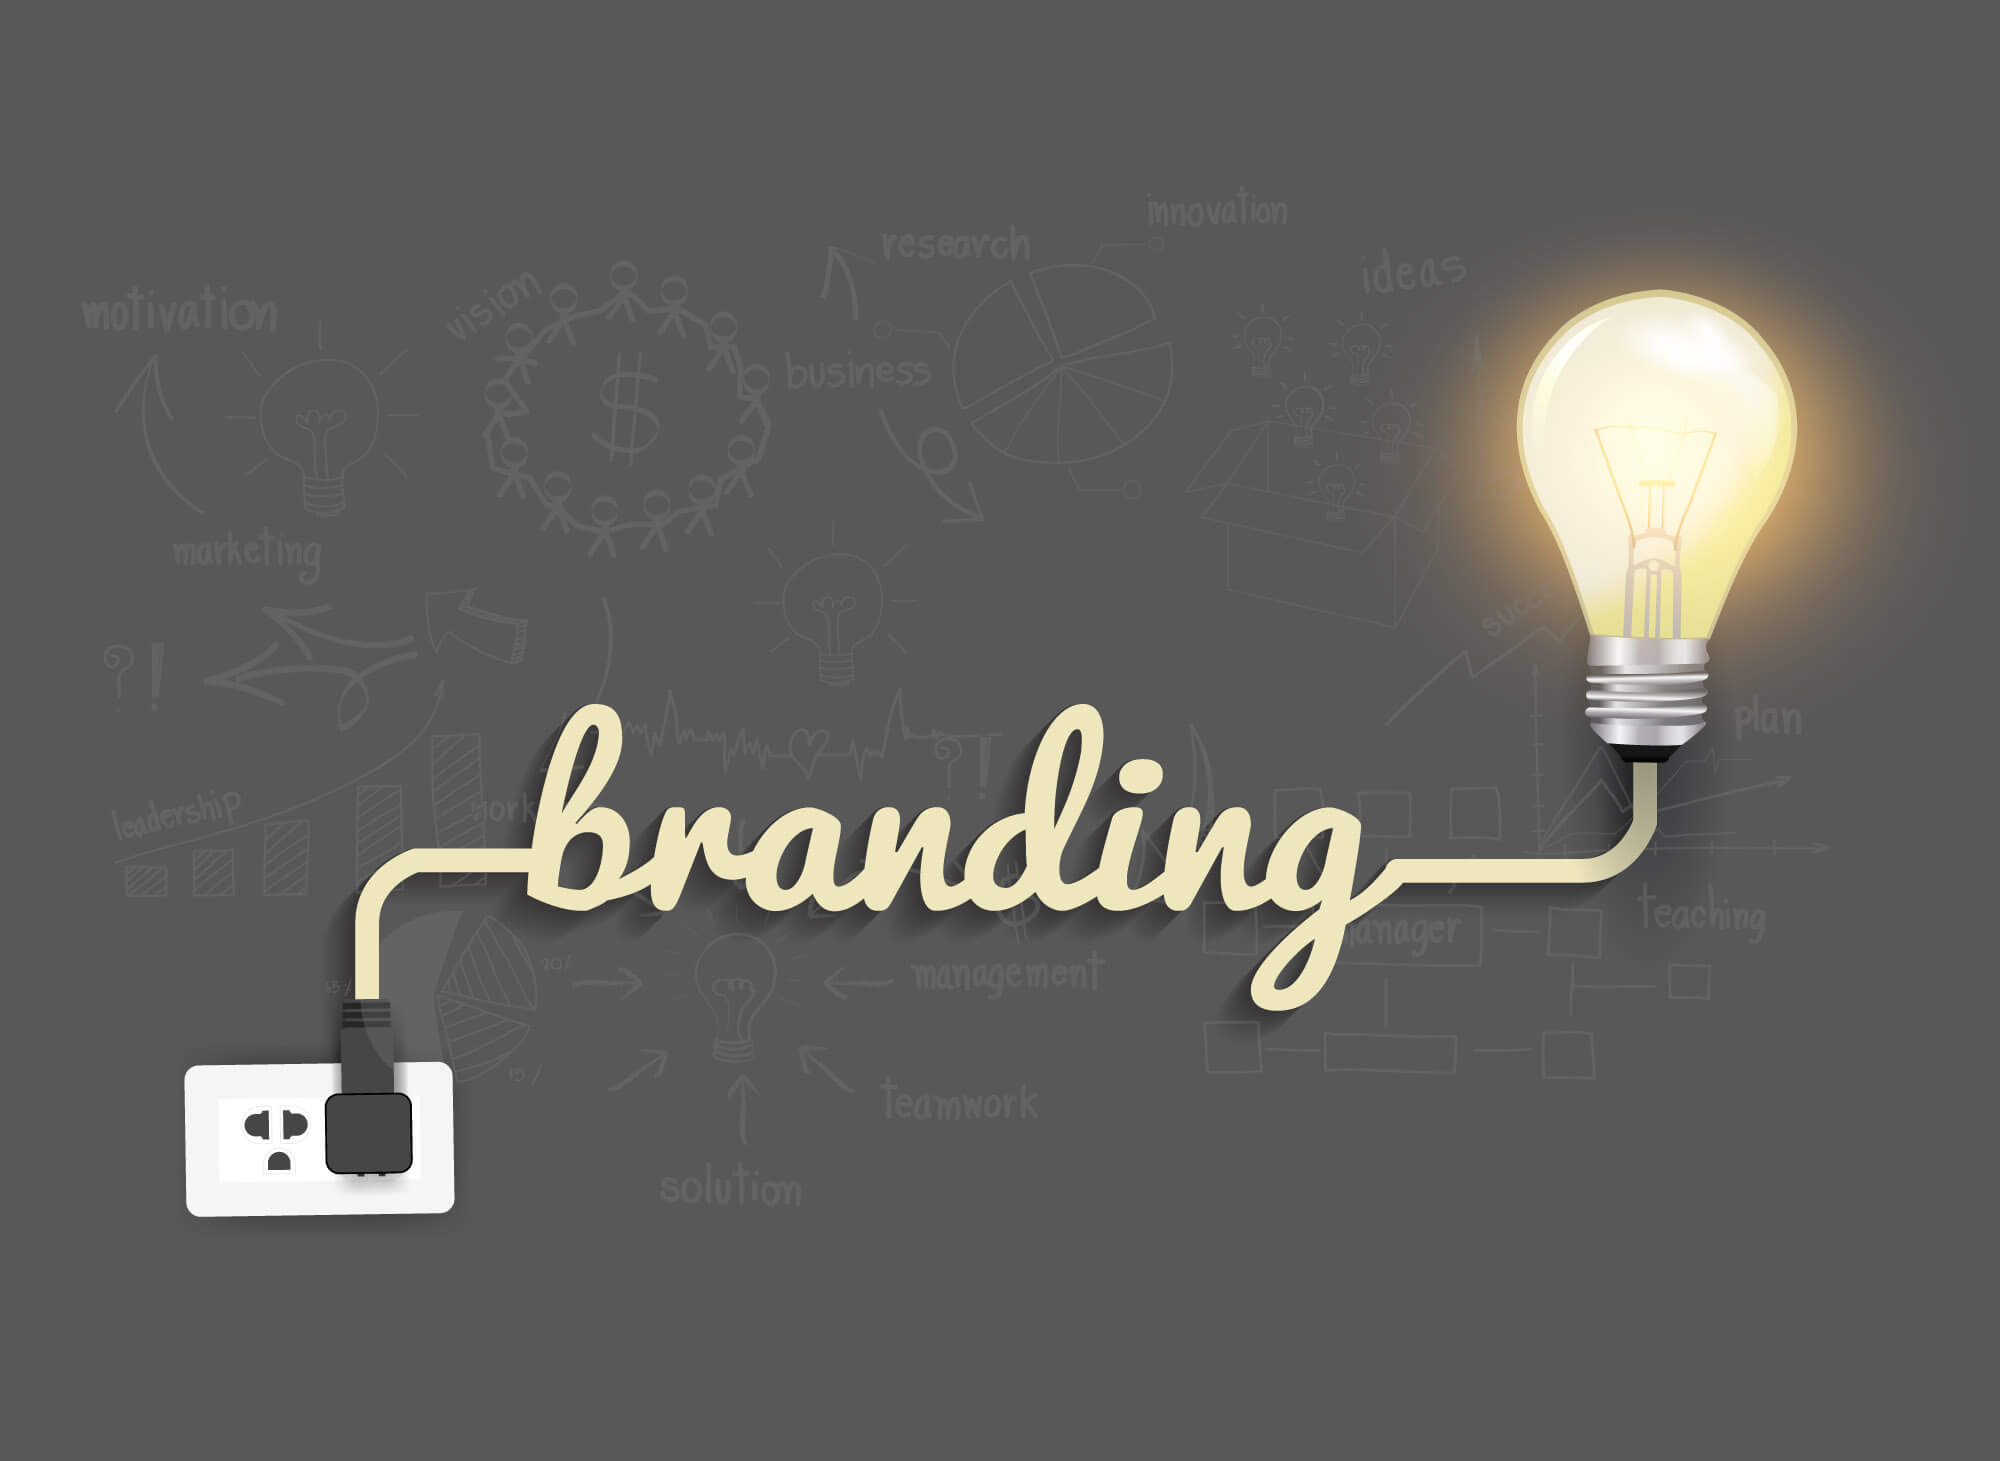 employer-branding 5